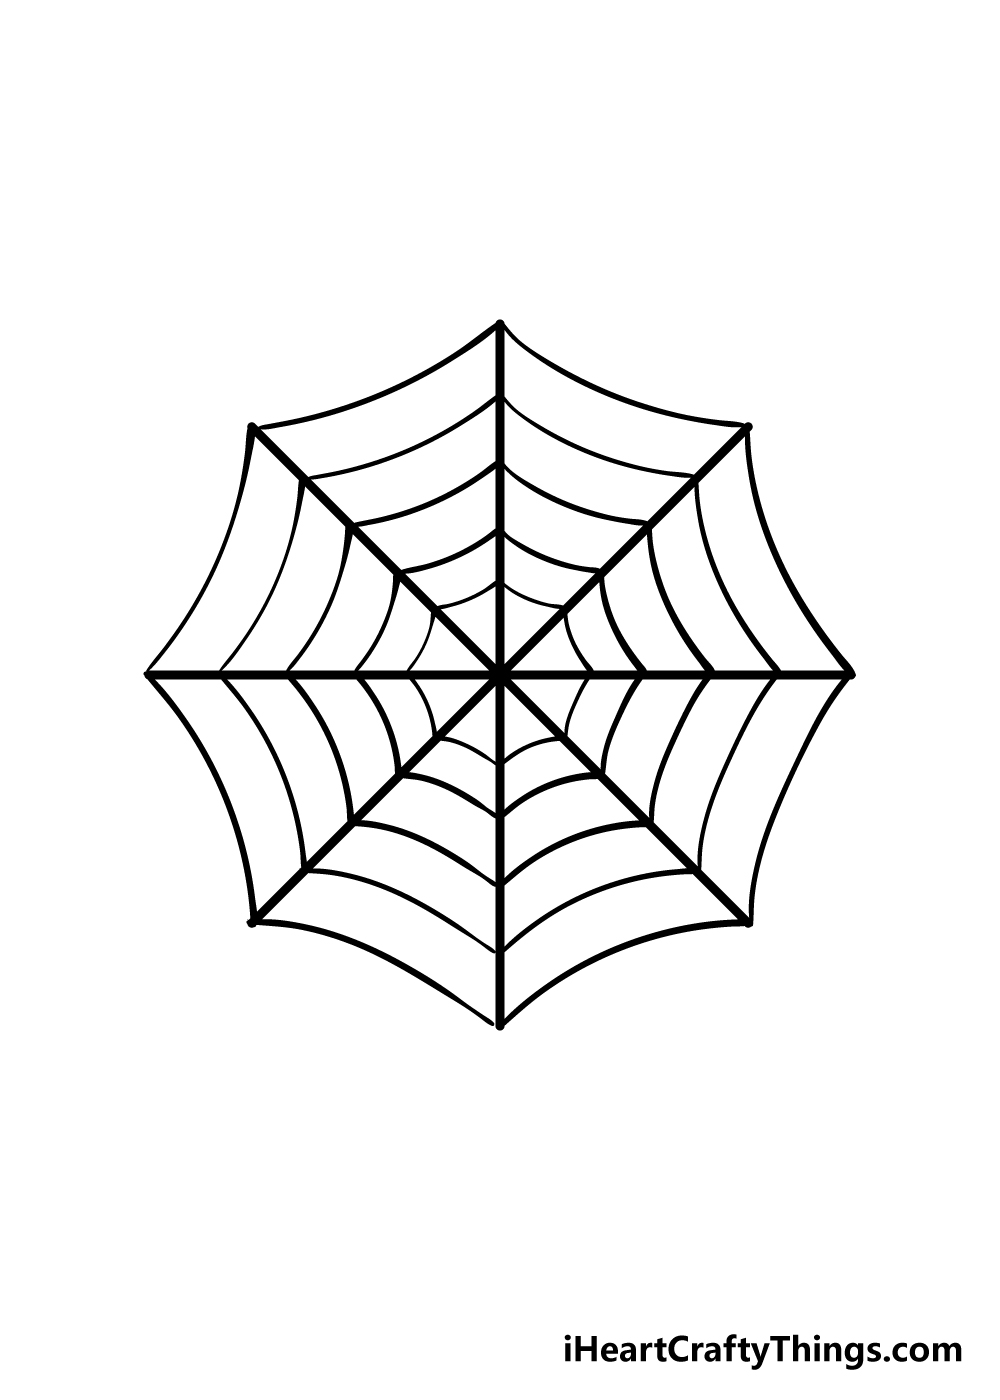 spiderweb drawing step 5